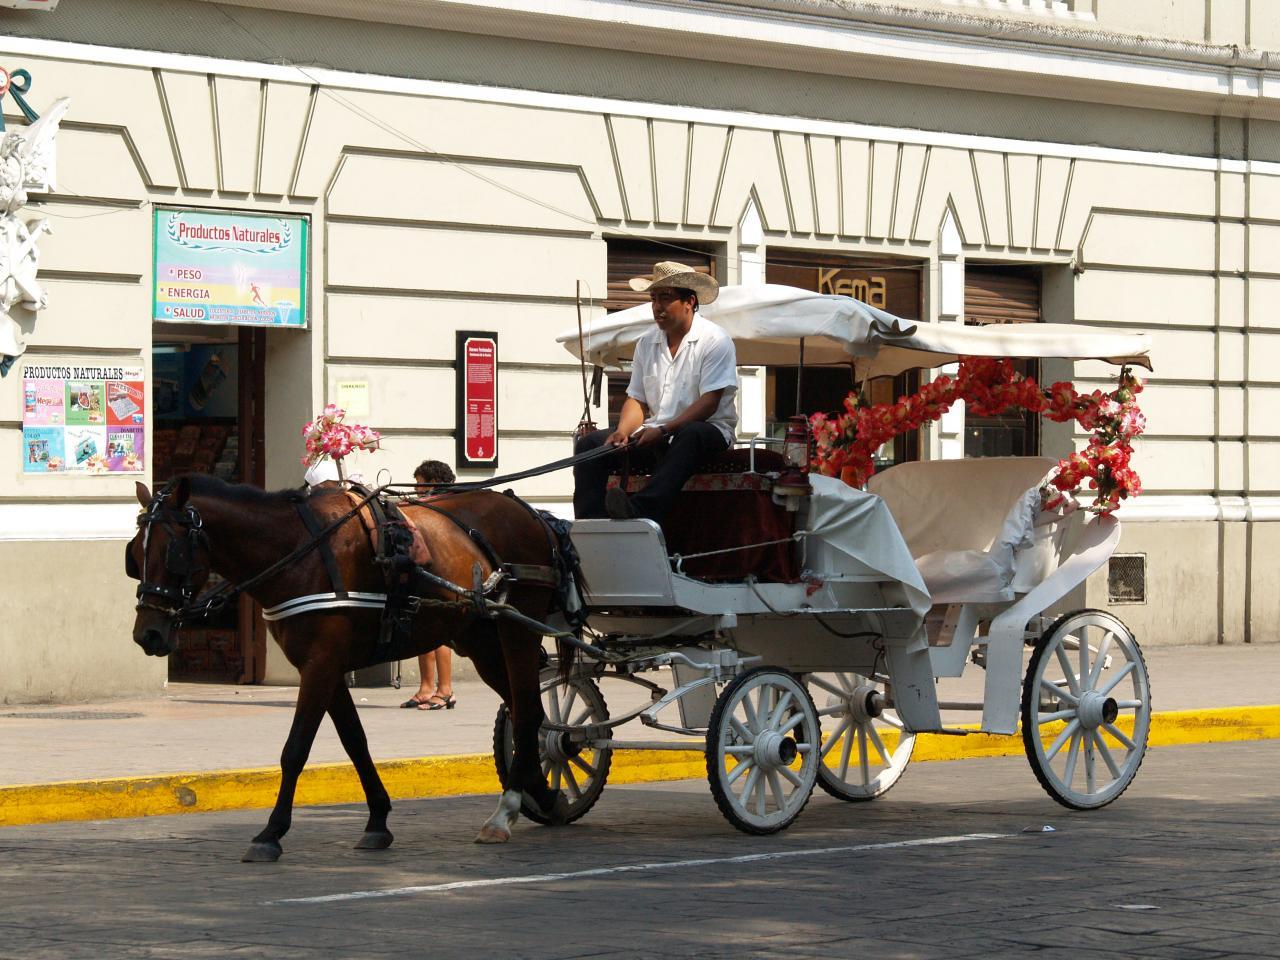 Calèche de la ville de Mérida